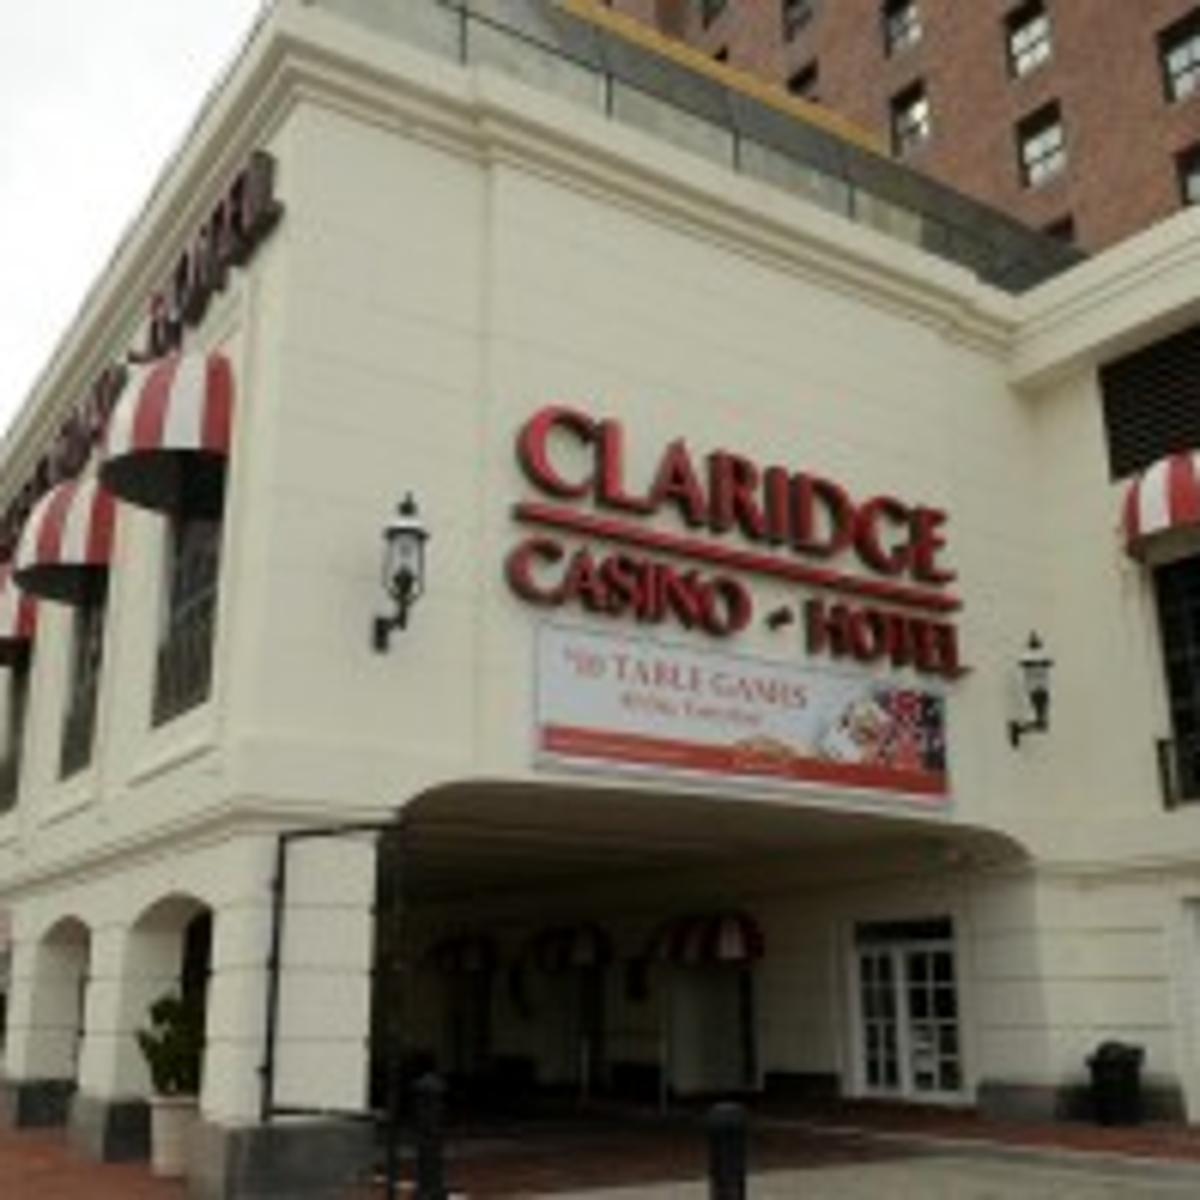 Claridge casino atlantic city nj 1 bruton street casino